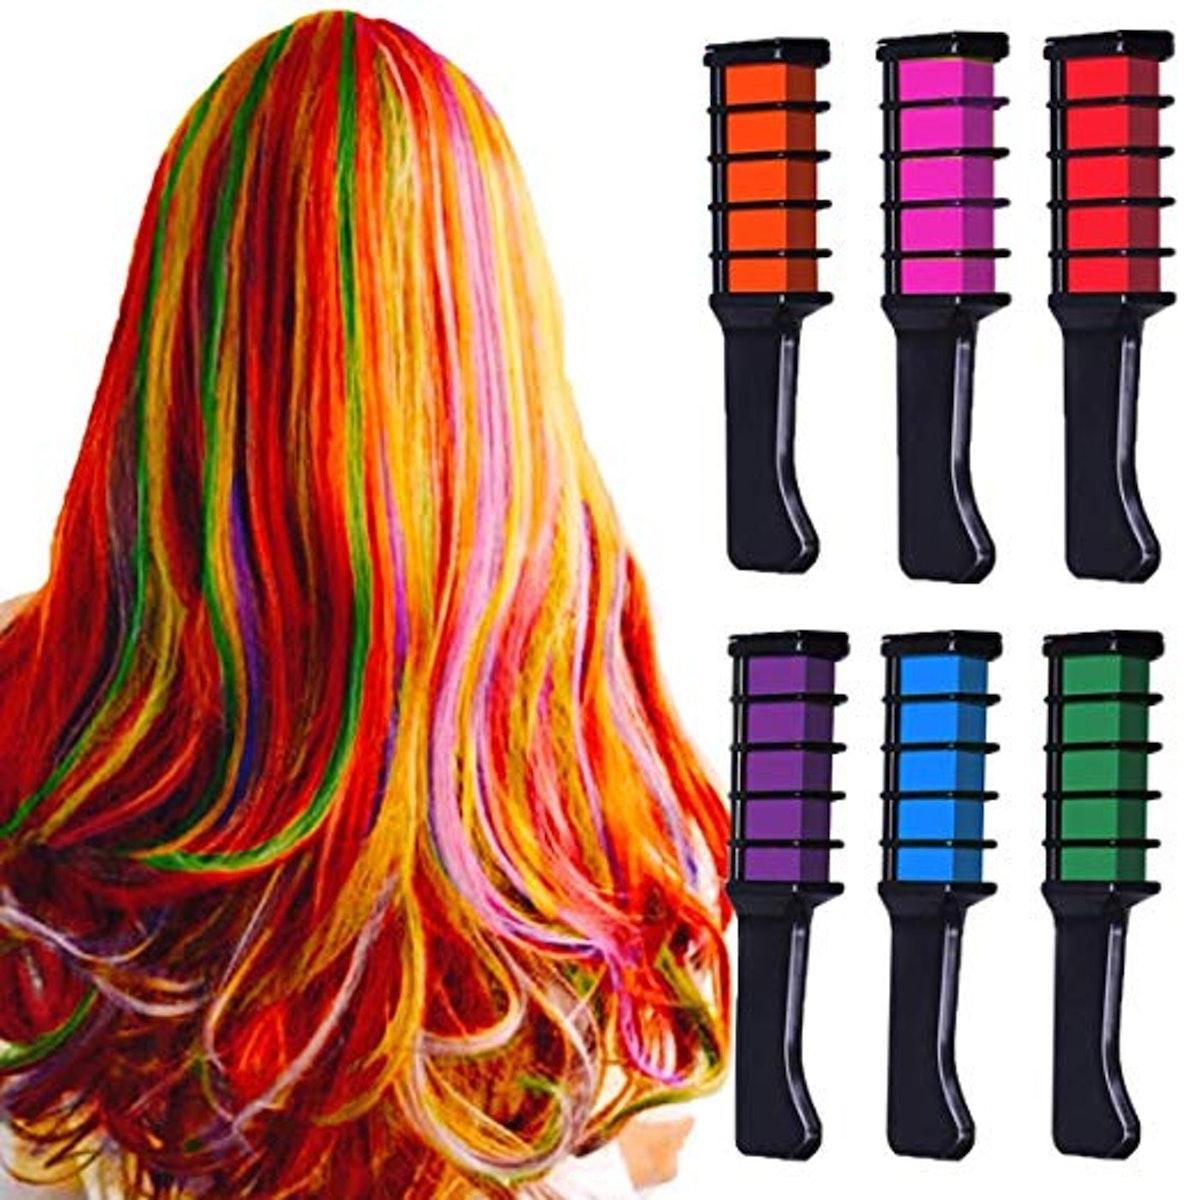 MSDADA Hair Chalk Comb Temporary Bright Hair Color Dye